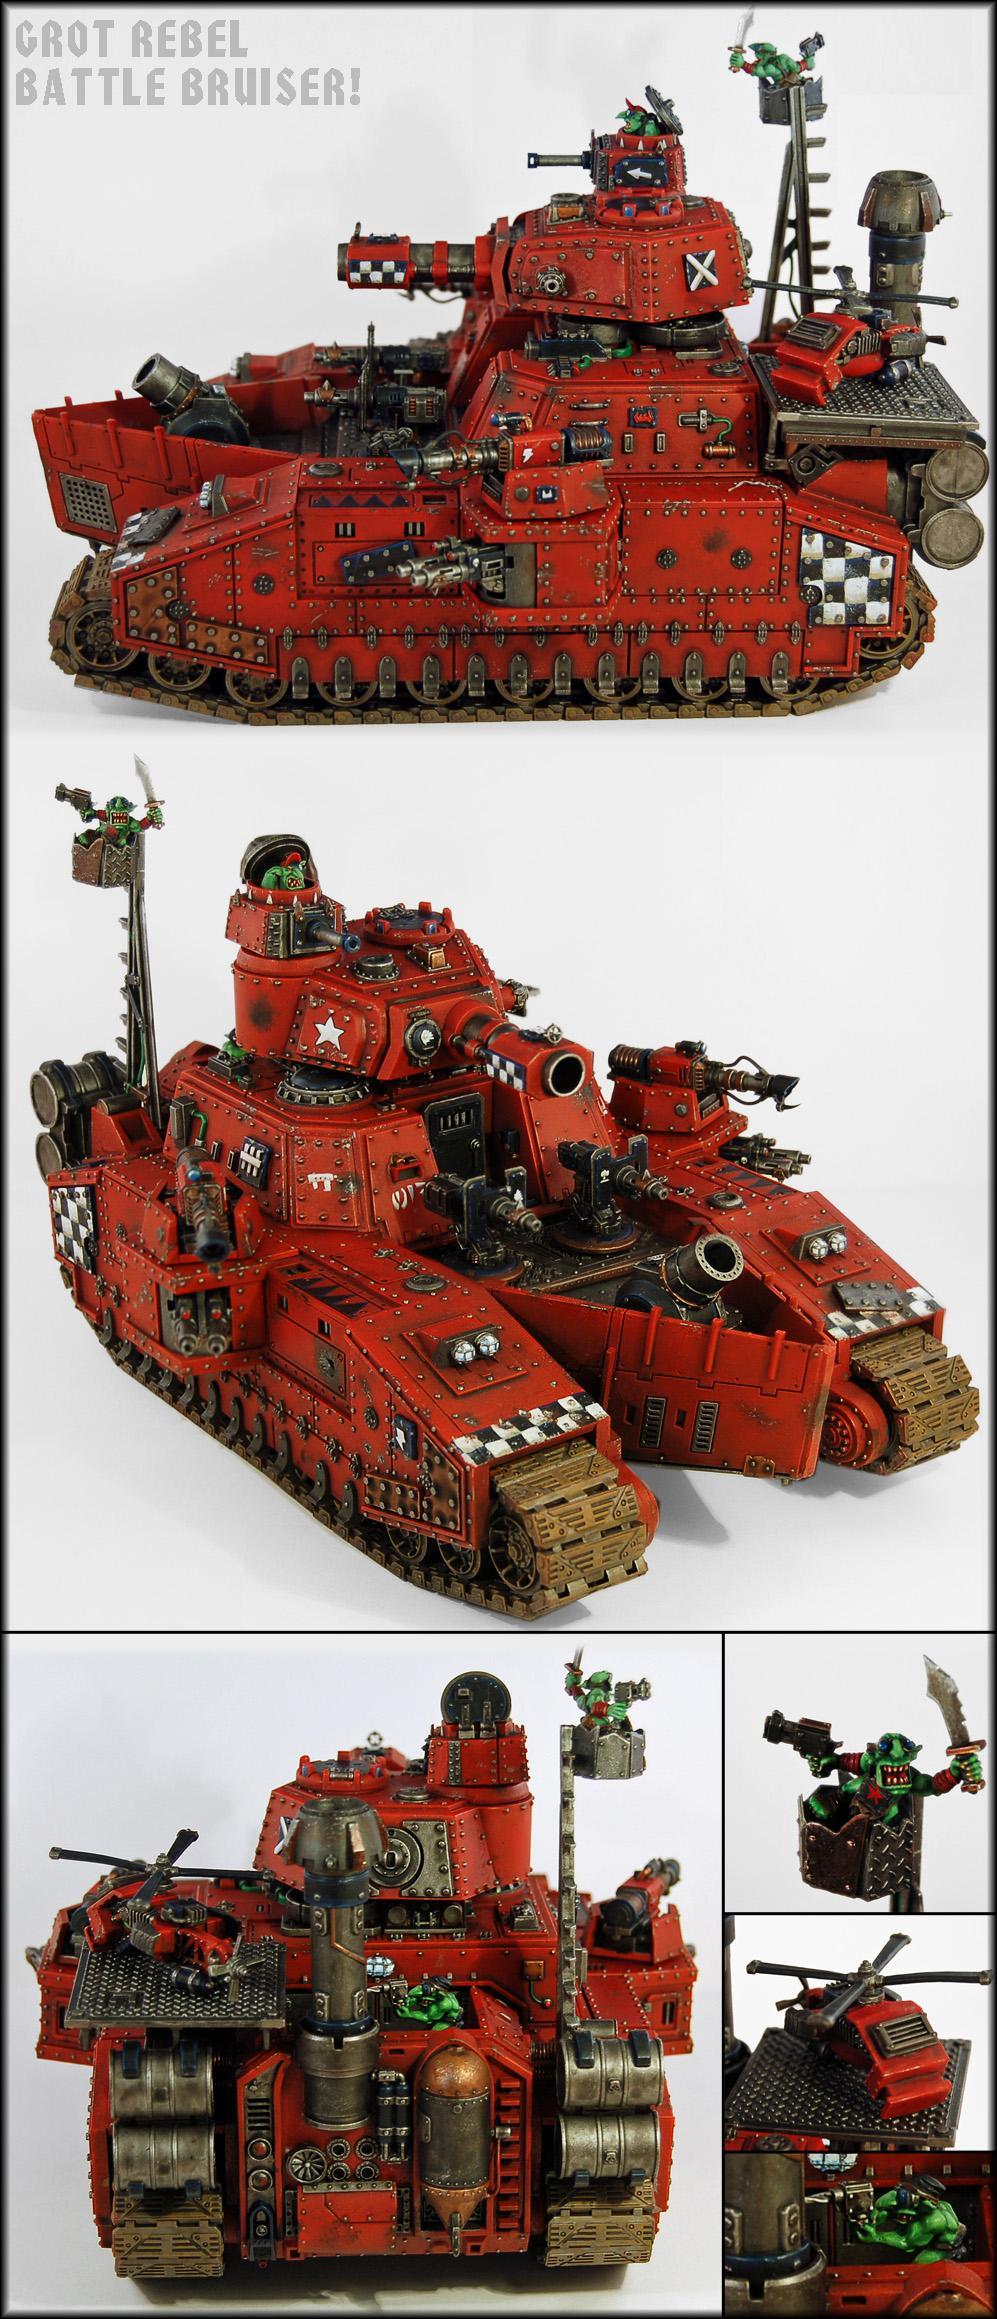 Baneblade, Battleship, Battlewagon, Greenskins, Gretchin, Grot Mega Tank, Grots, Grotz, Guard, Hellhammer, Imperial Guard, Looted, Orks, Warhammer 40,000